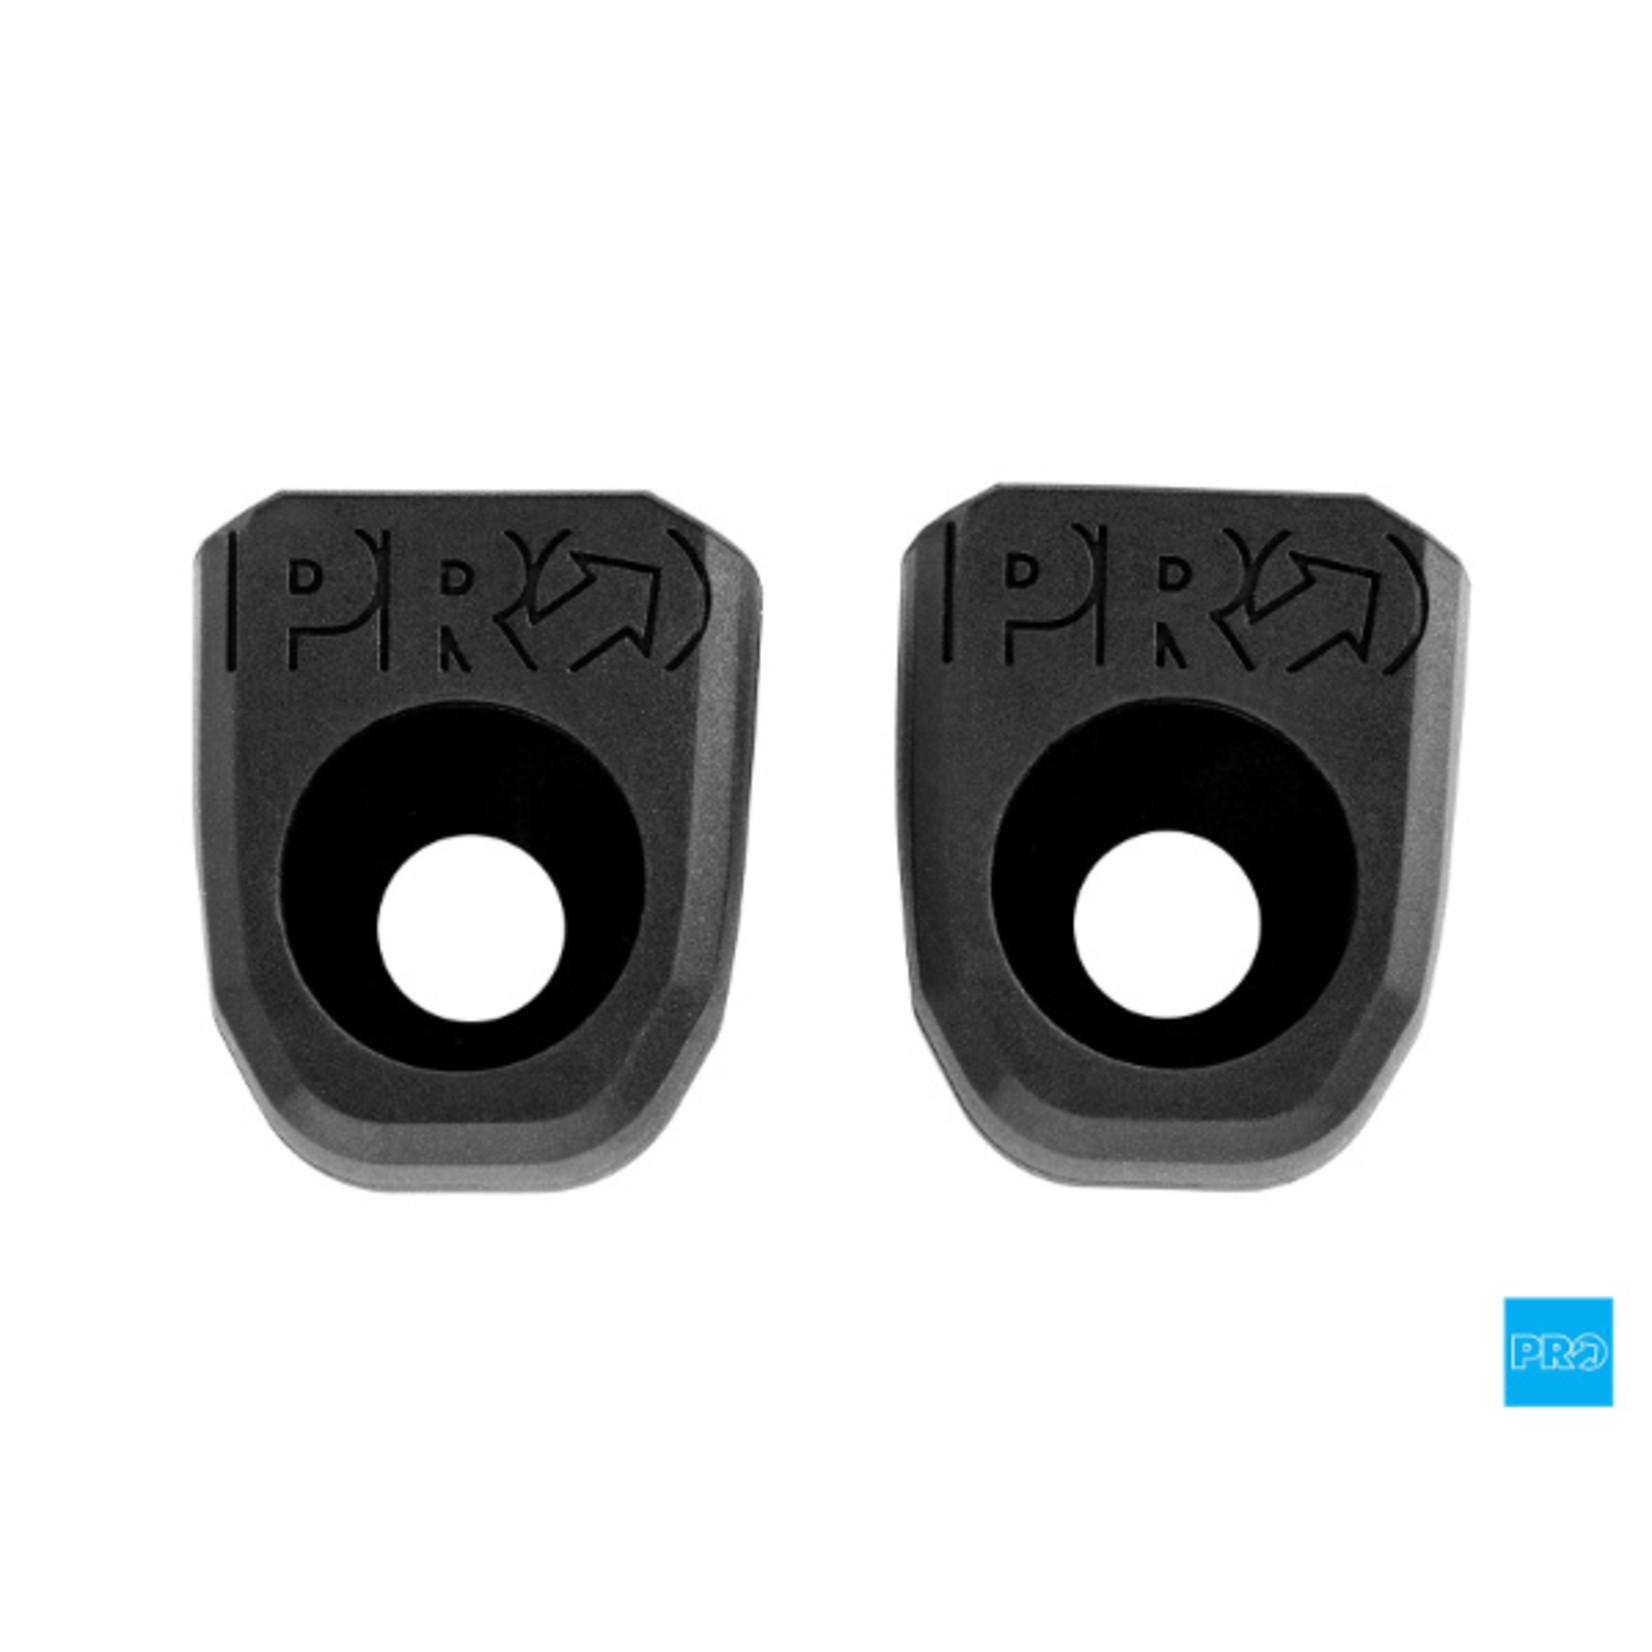 Pro Components Pro, Crank Protection Black